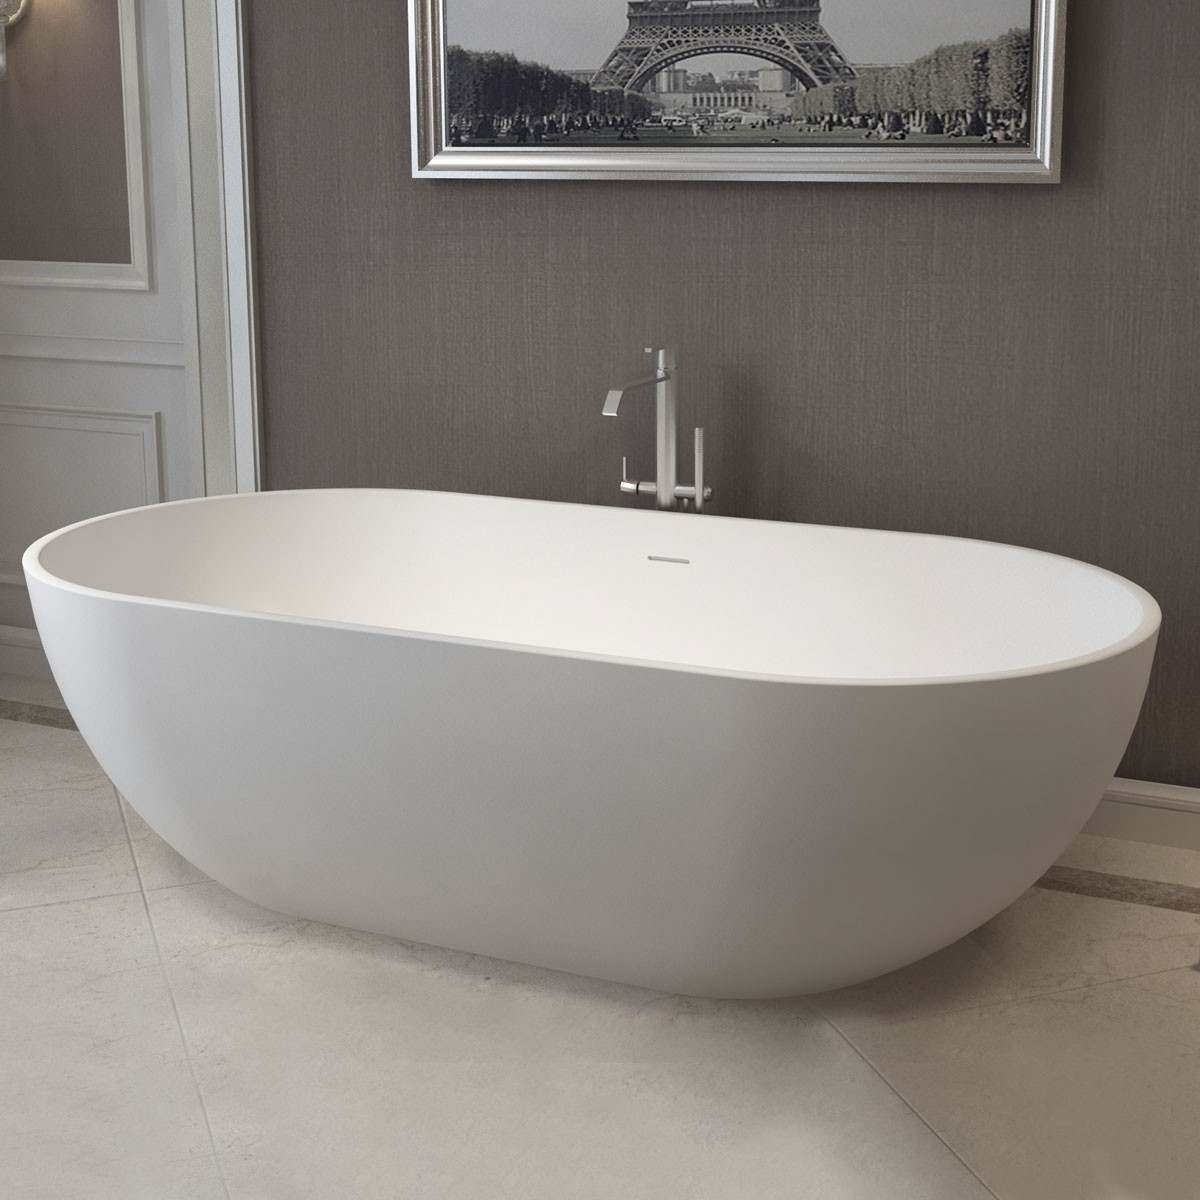 70 In Oval Synthetic Stone Freestanding Bathtub - Matte White (DK-HA8619)